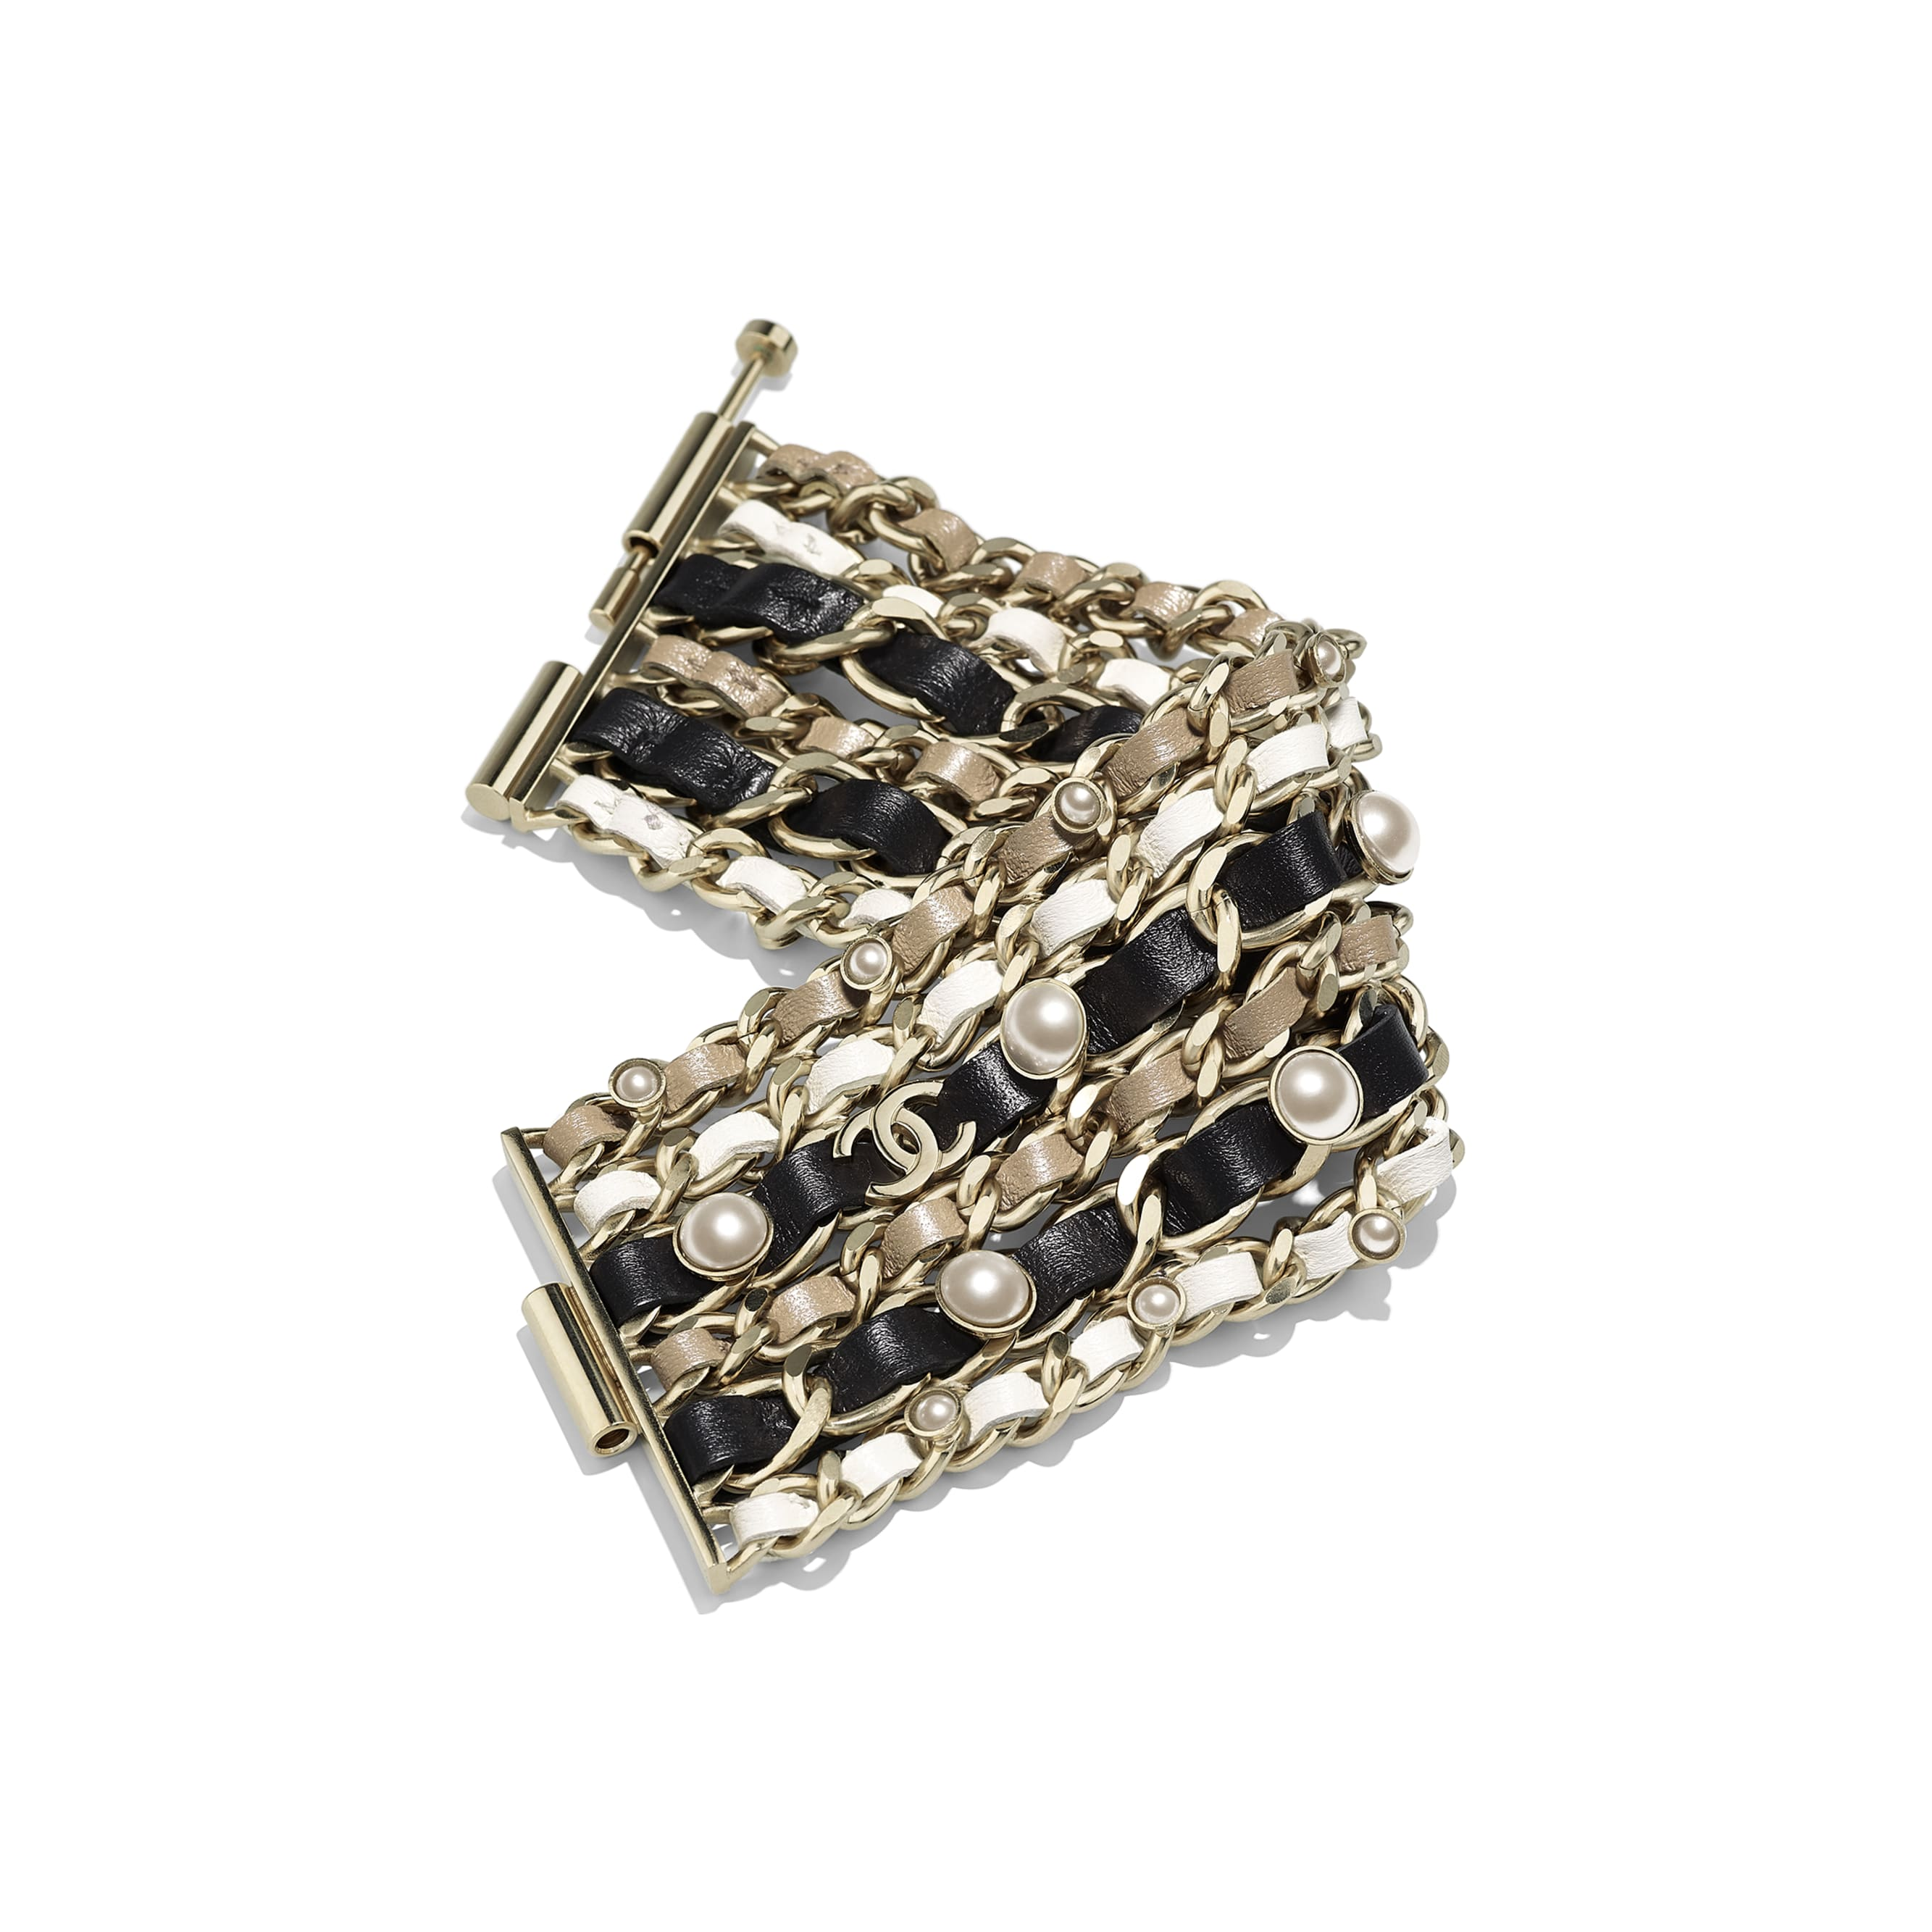 Cuff - Gold, Black, White & Beige - Metal, Lambskin, Glass Pearls & Imitation Pearls - Alternative view - see standard sized version